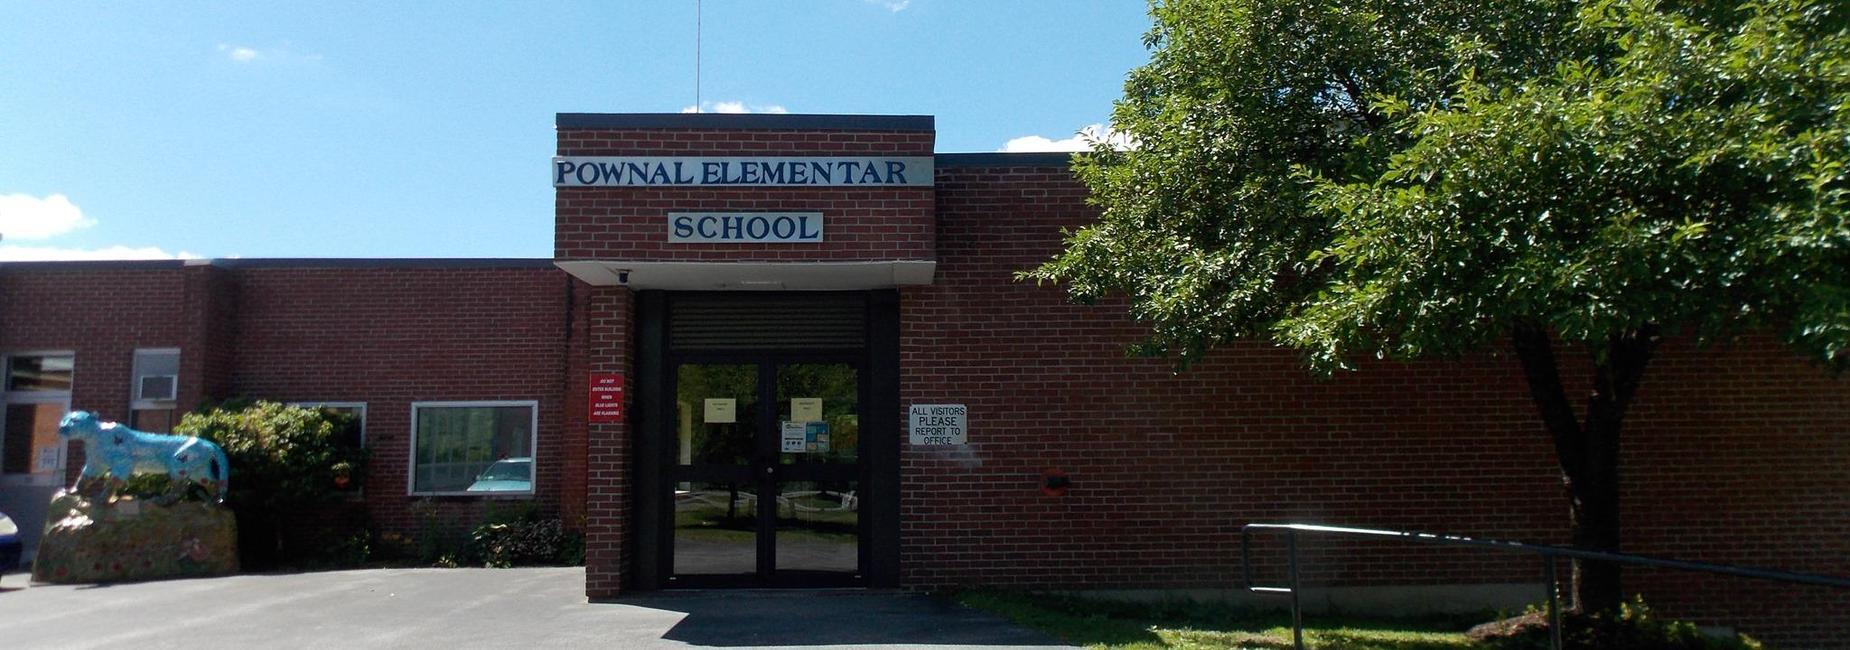 Pownal Elementary School